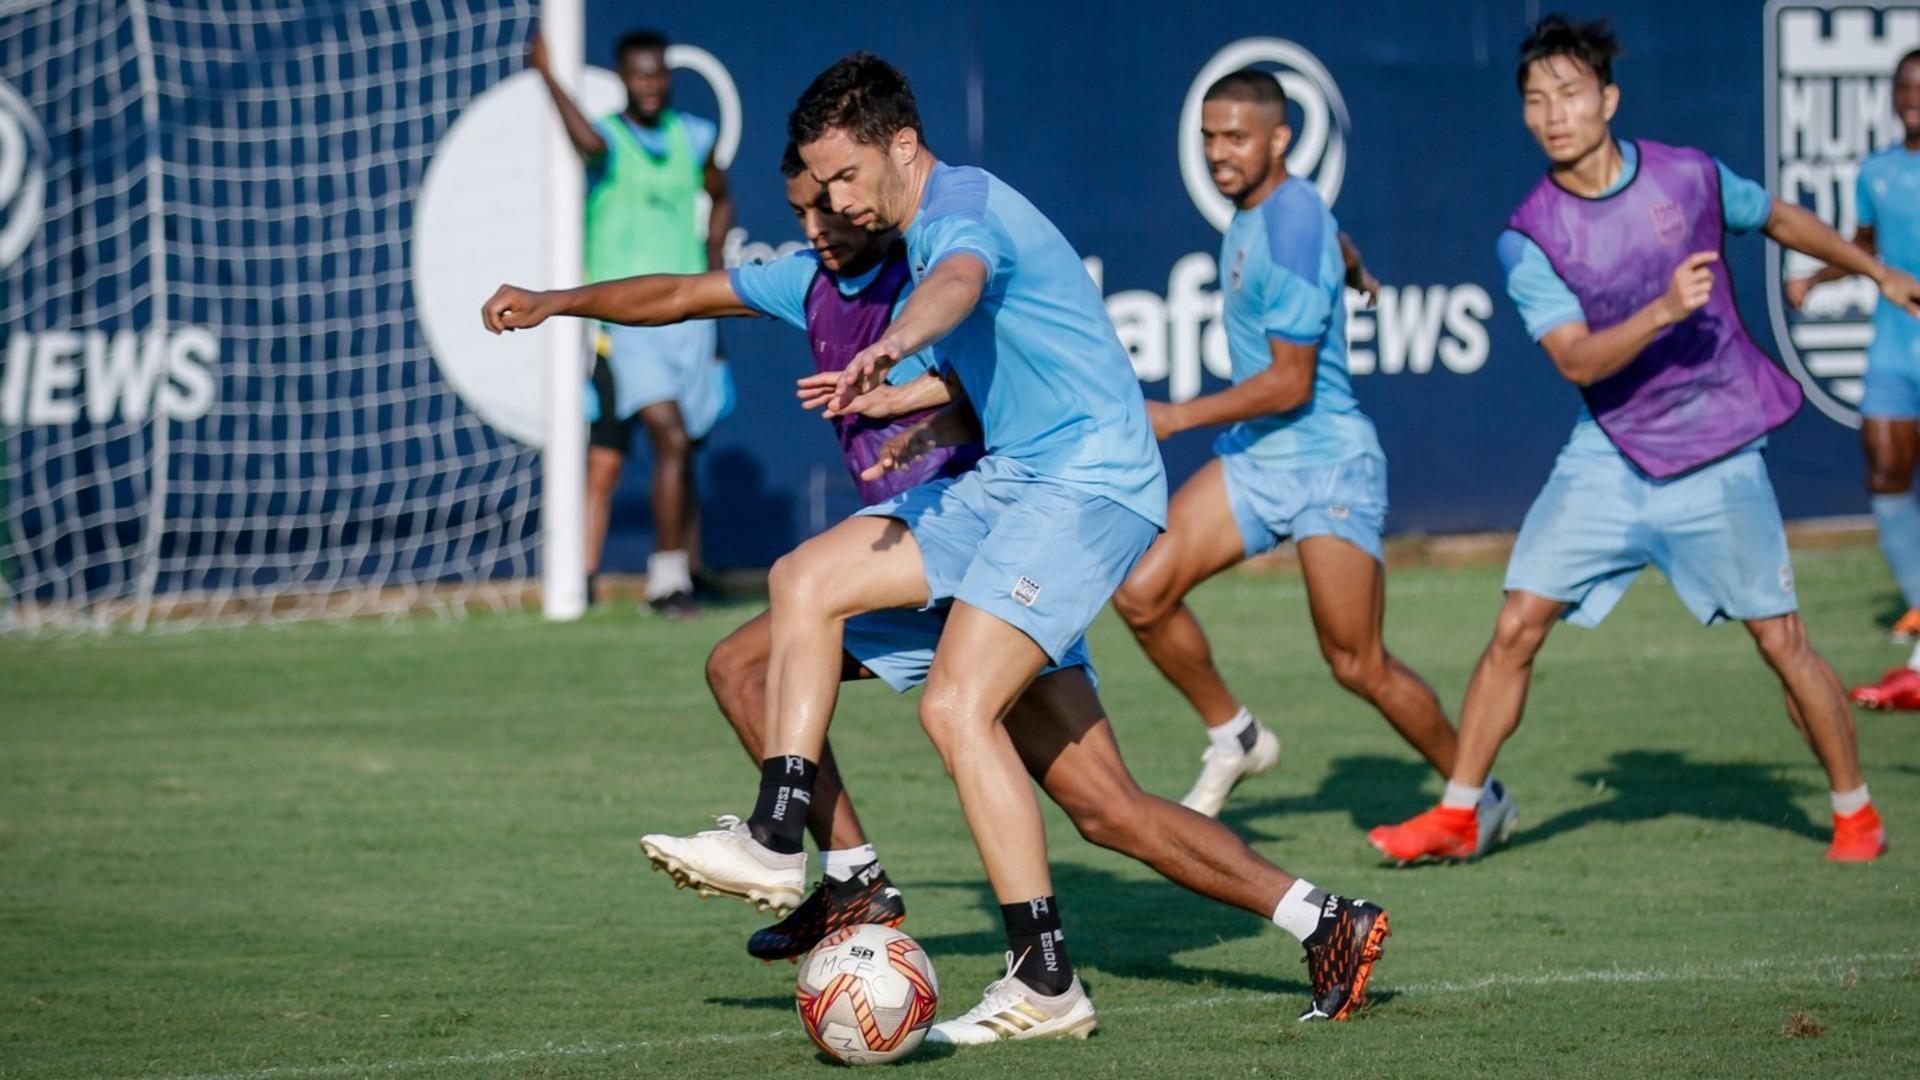 Chennaiyin FC vs Mumbai City: Match Preview, Team News, Where To Watch